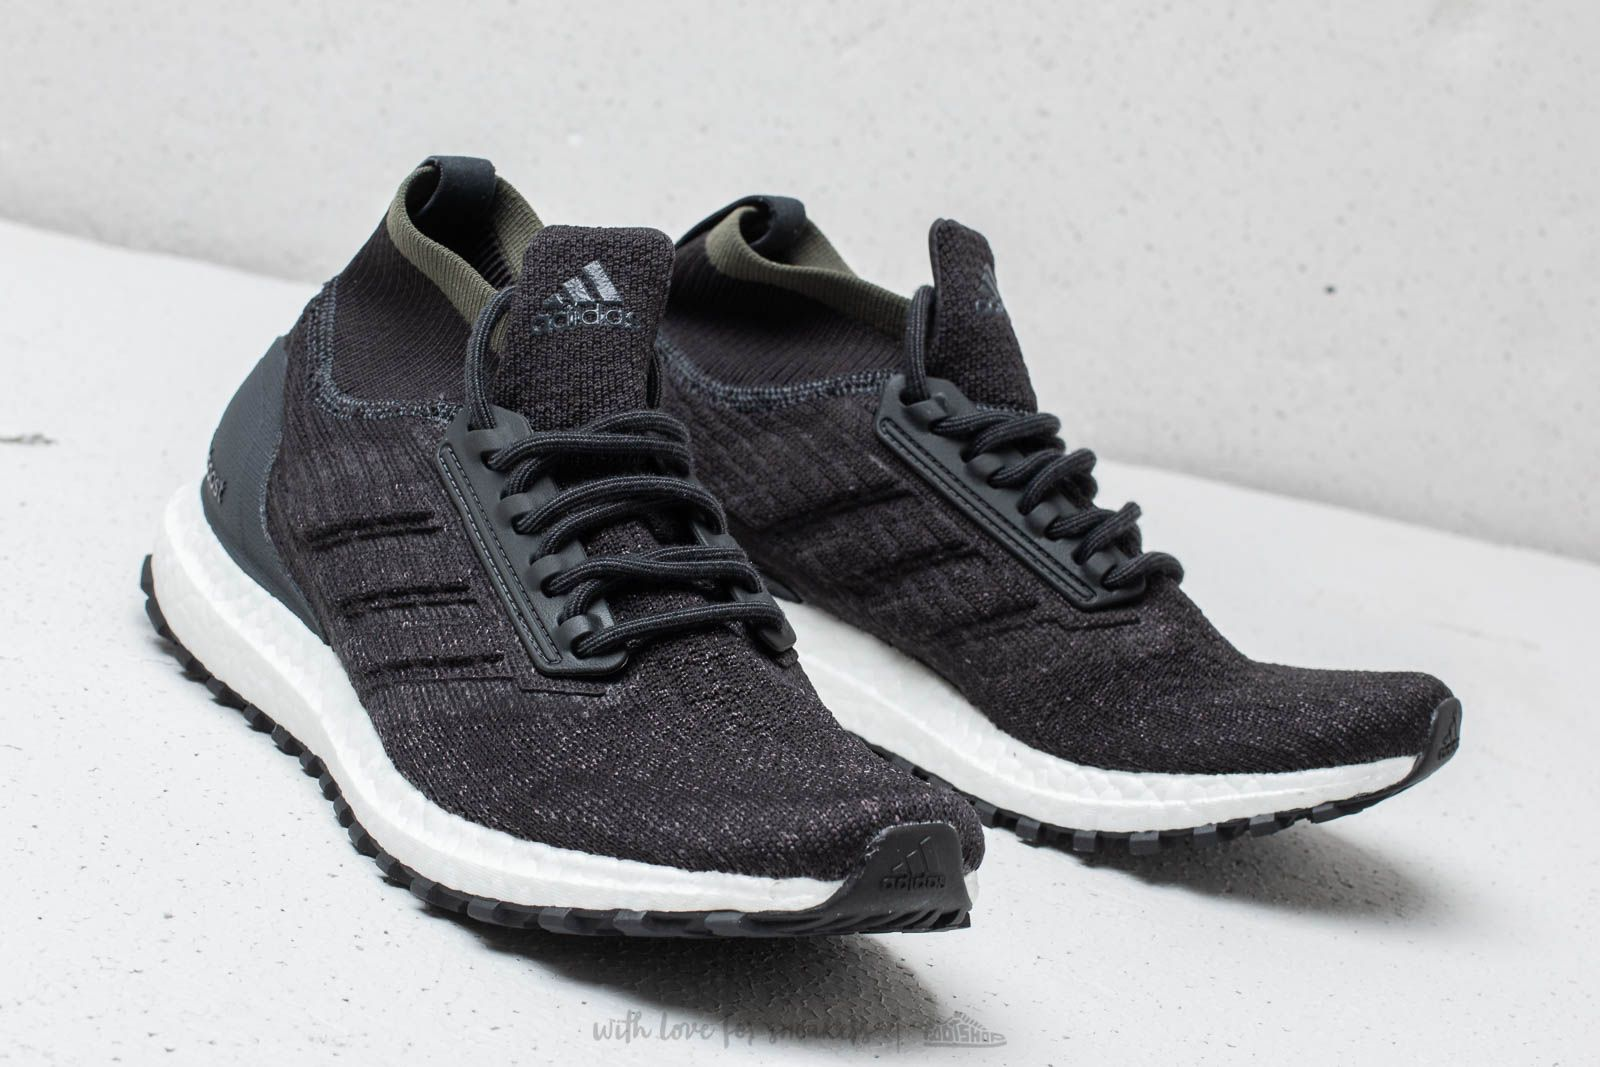 e2ecac94a1e closeout adidas ultra boost shoes black 66dd3 7e970